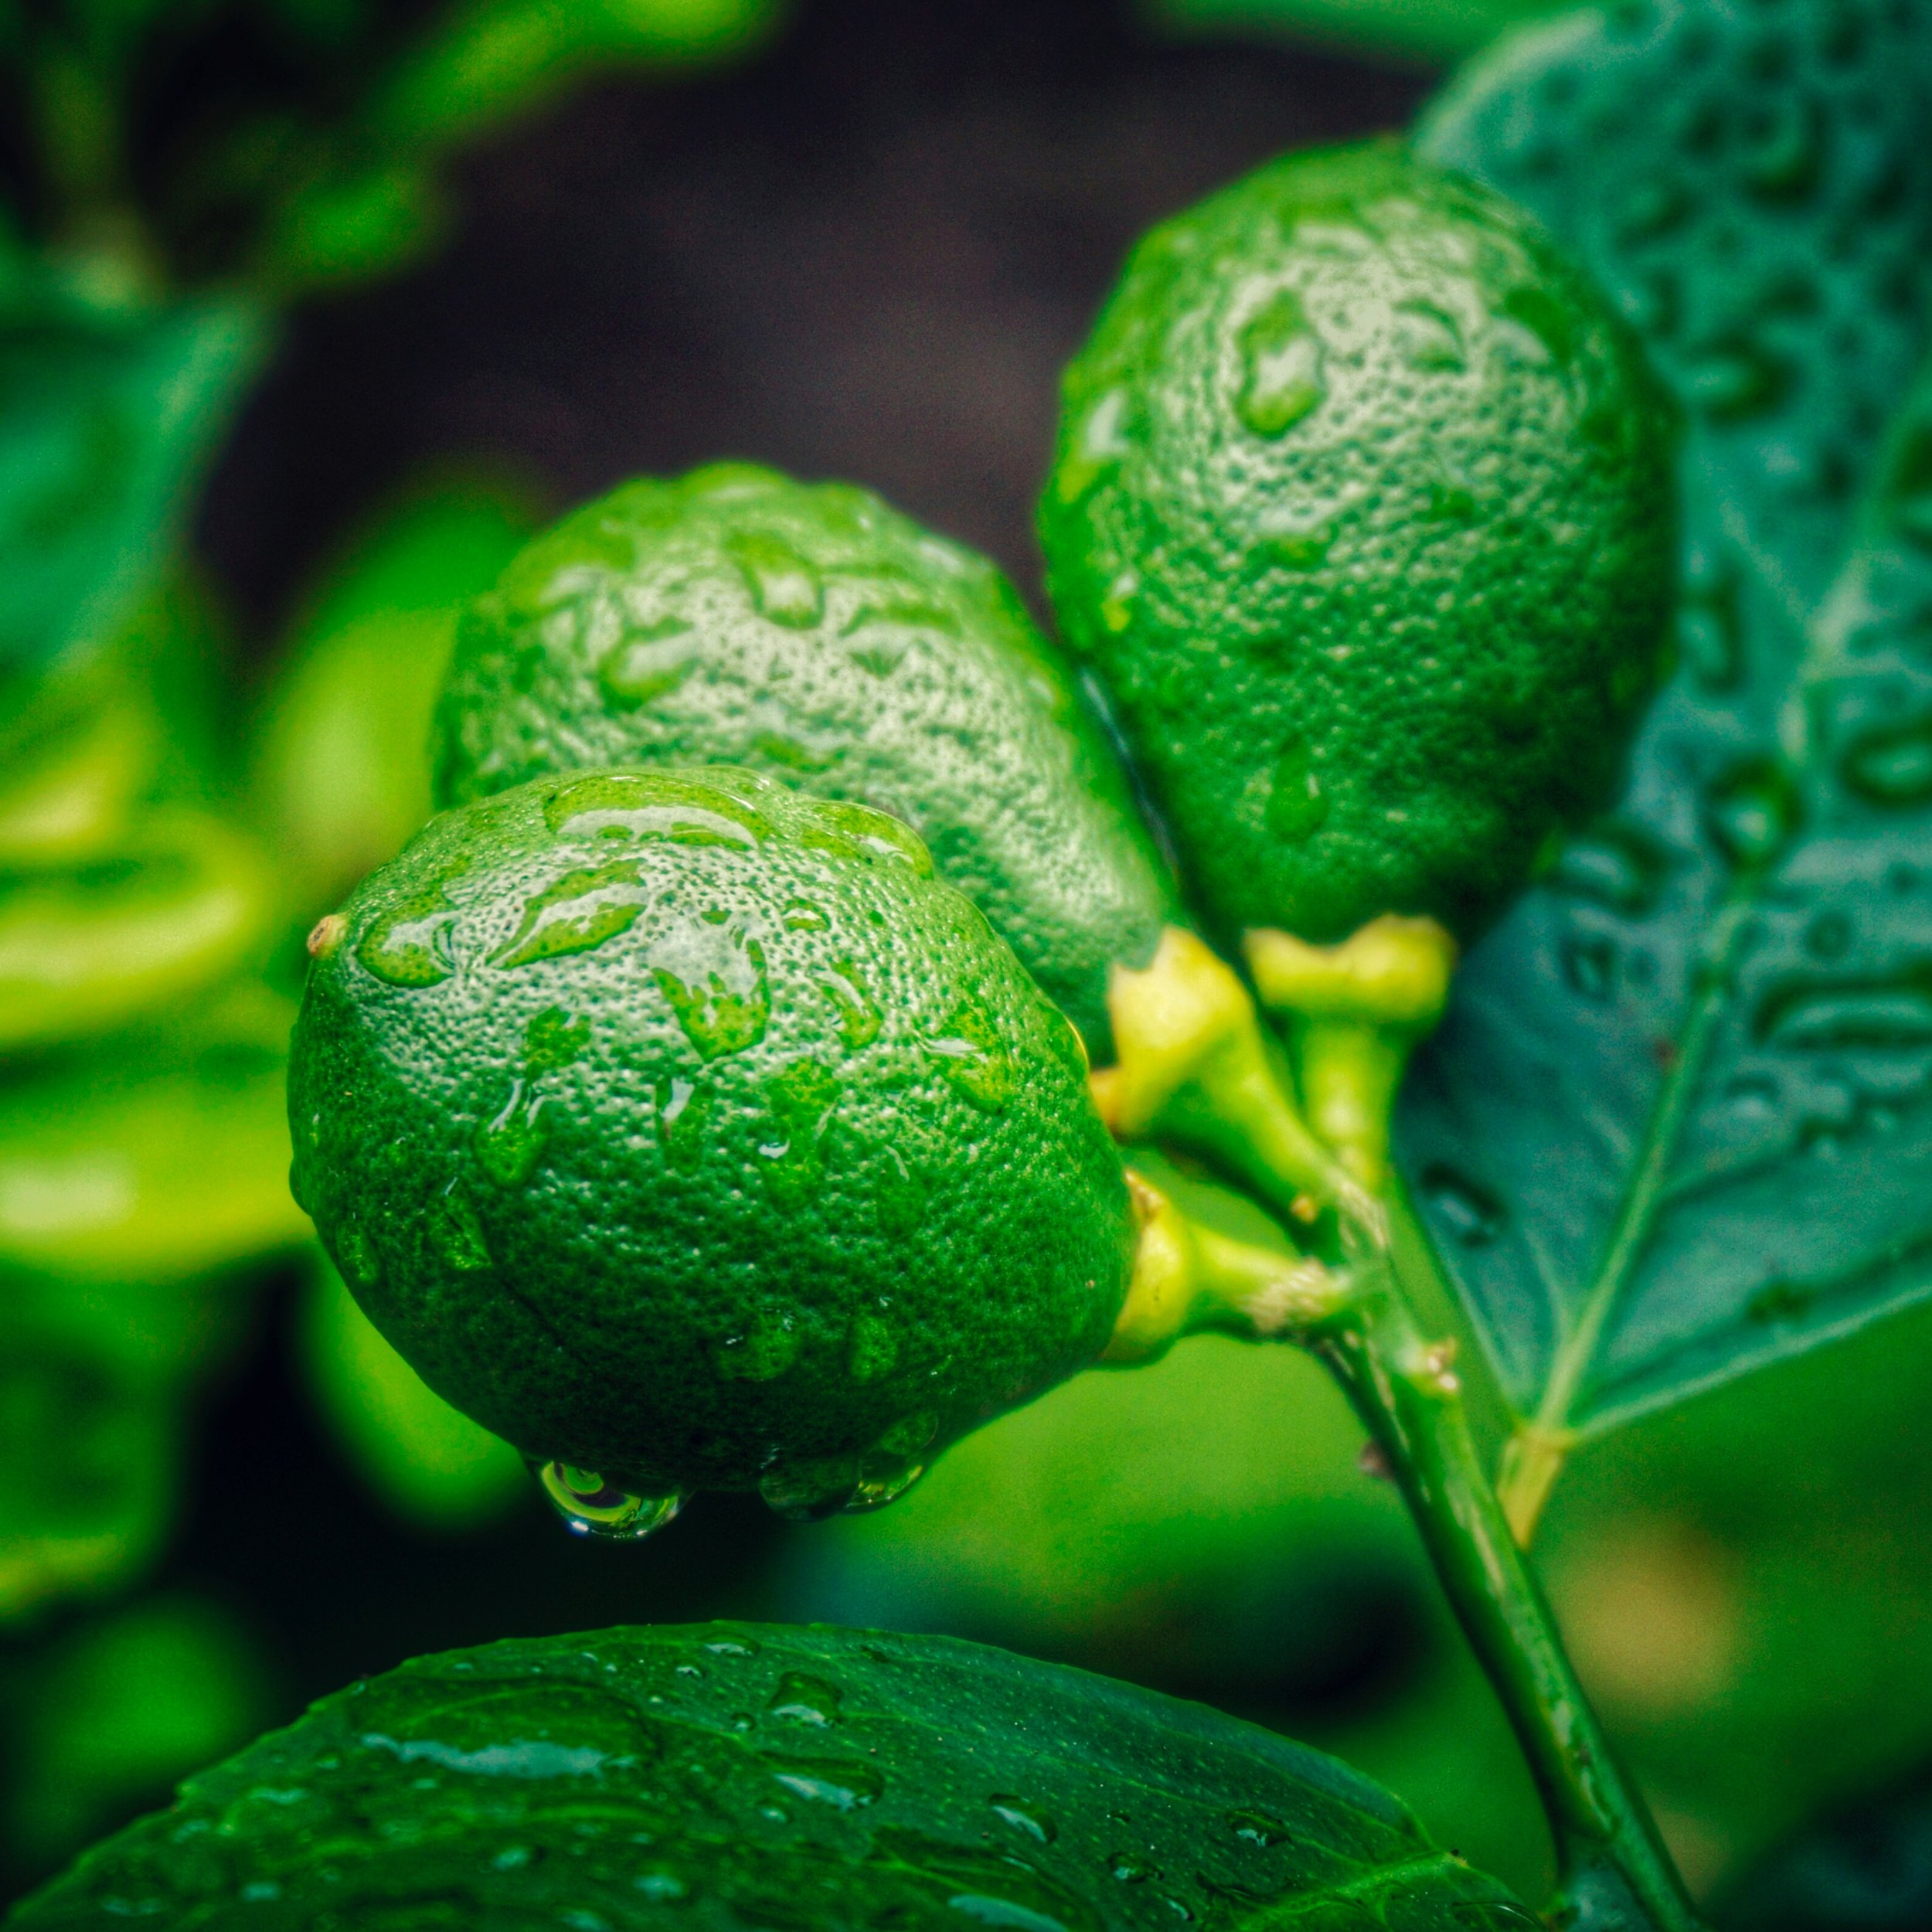 Teardrop-shaped green blobs. Photo by  Dawn Armfield .